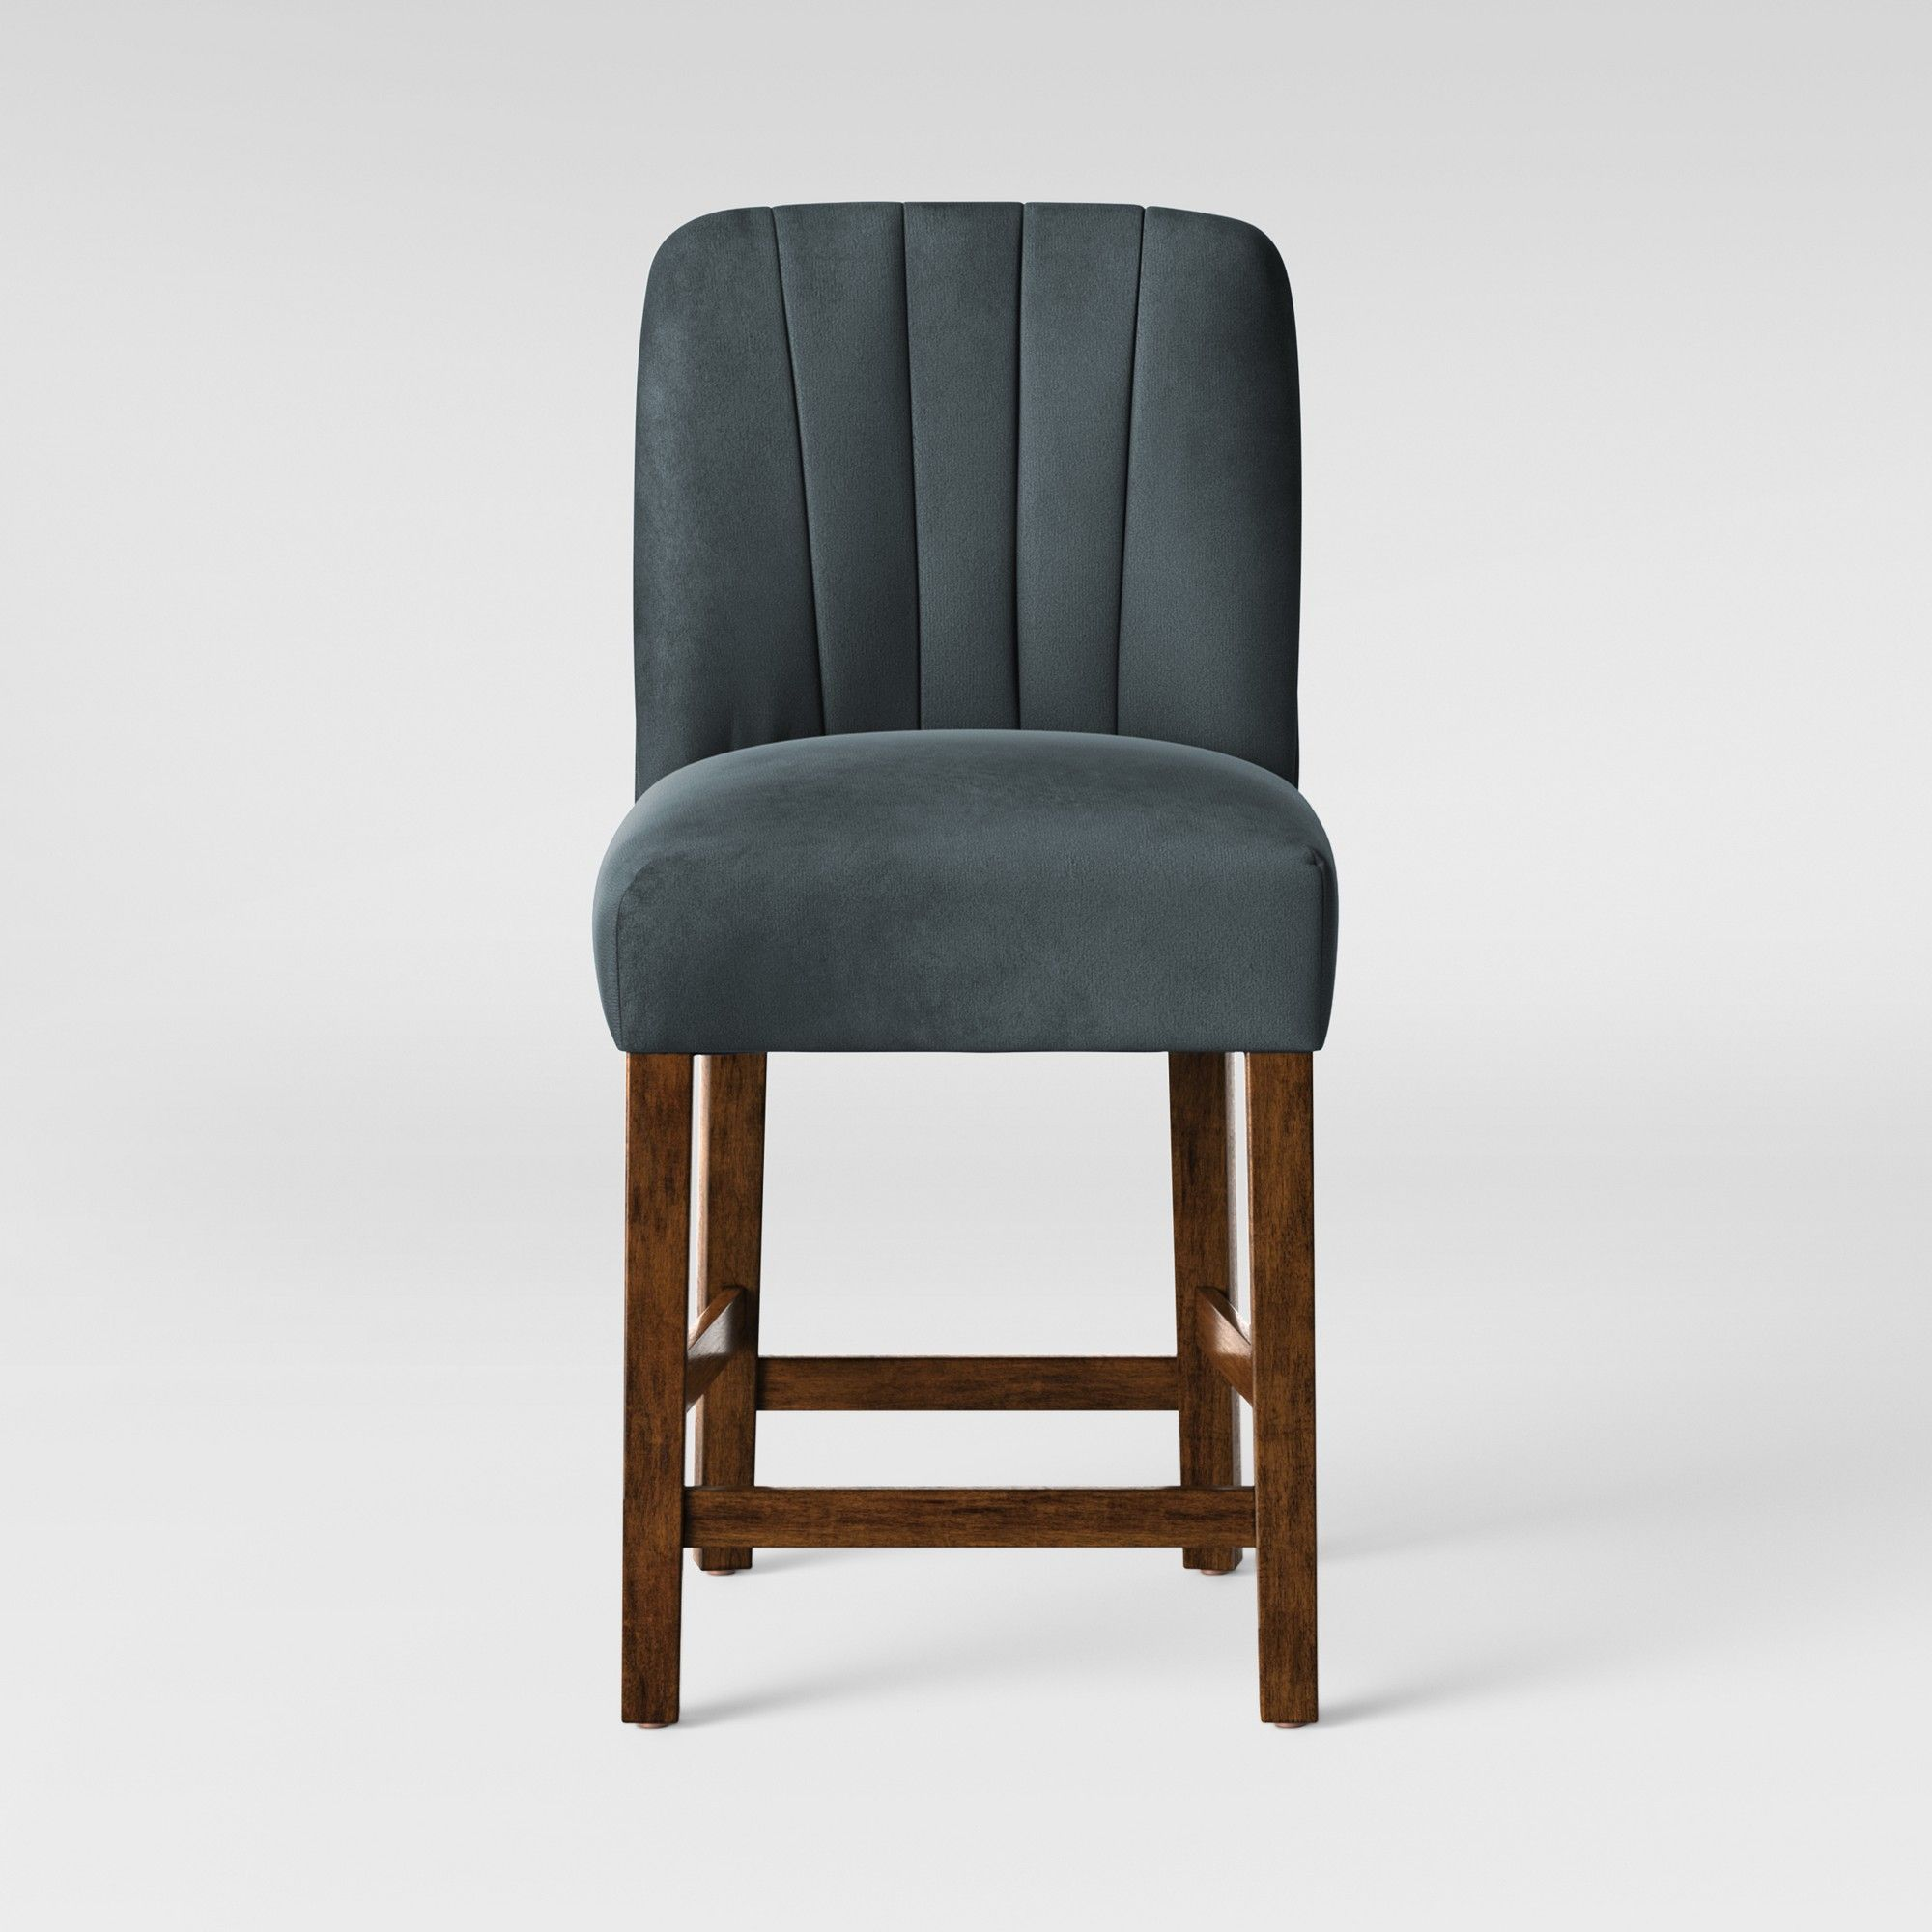 Pleasing Malia 25 Channel Back Tufted Counter Stool Velvet Blue Ibusinesslaw Wood Chair Design Ideas Ibusinesslaworg